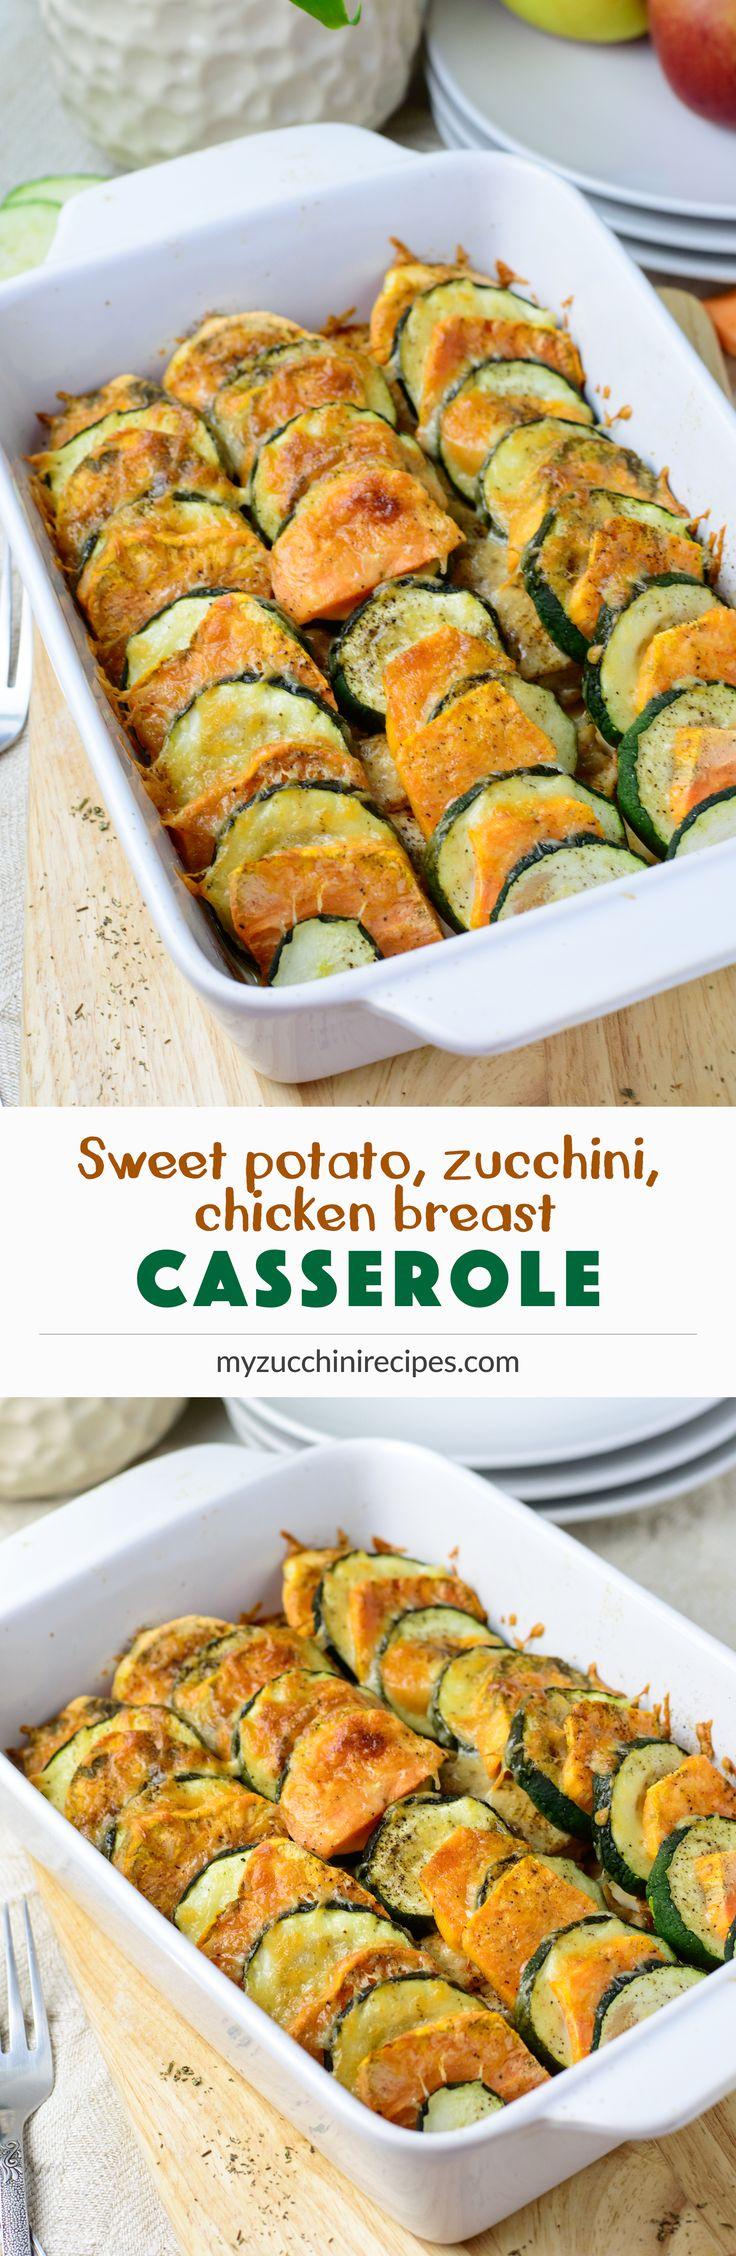 Sweet potato, zucchini and chicken breast casserole #lowcarb, #glutenfree